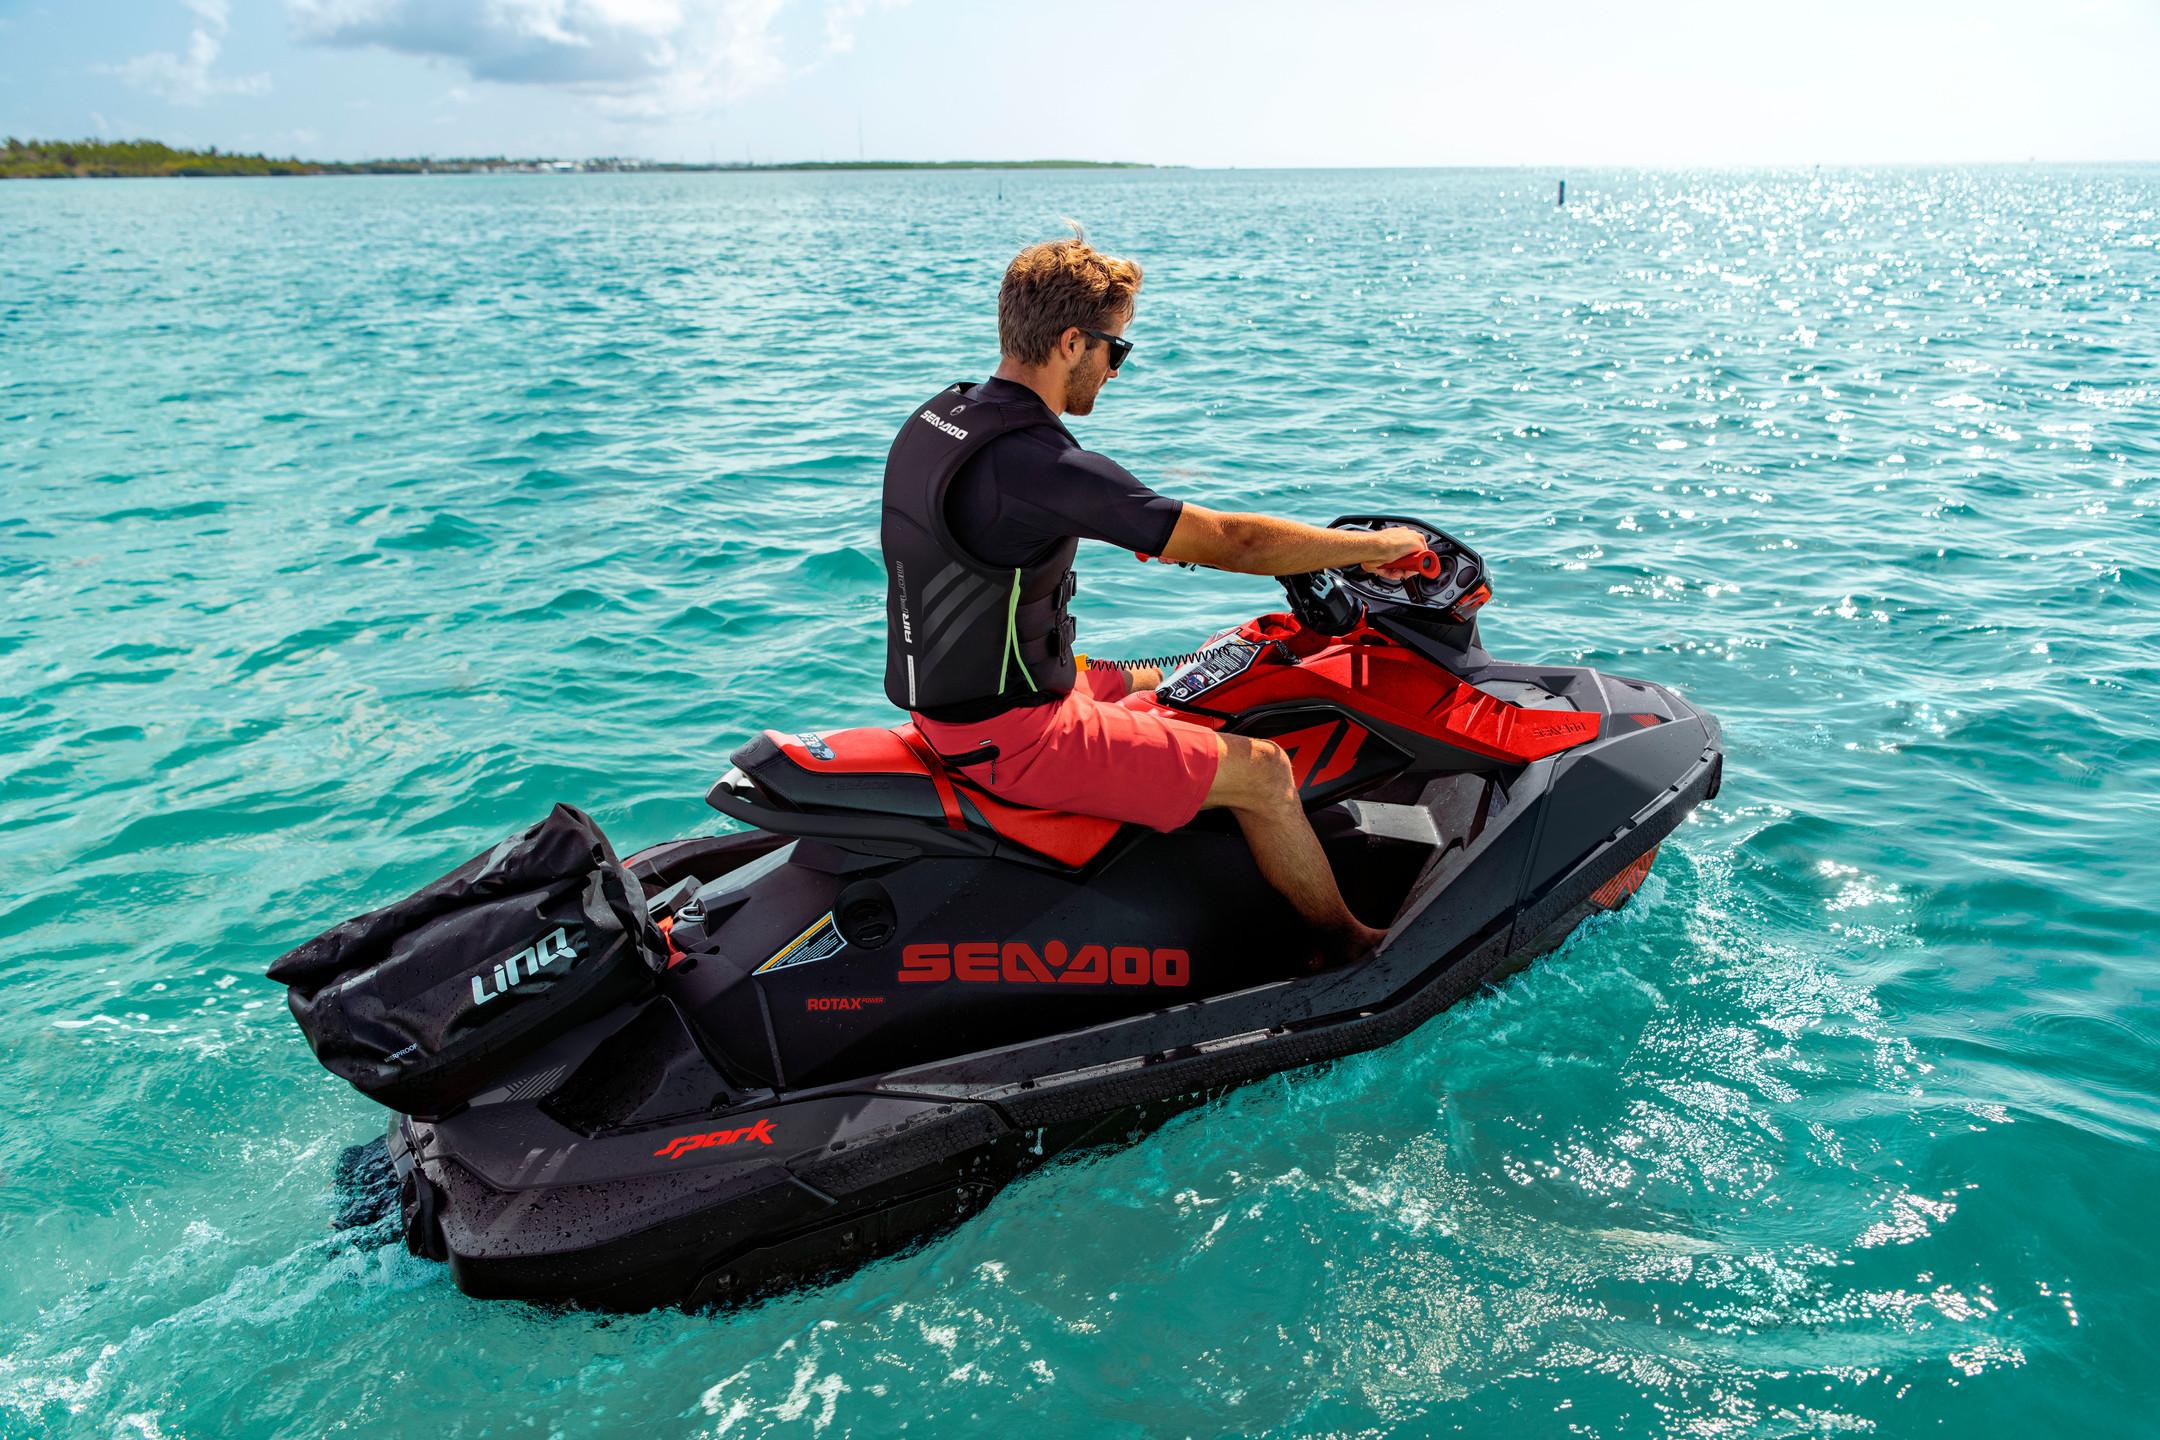 2021 SeaDoo Spark Trixx